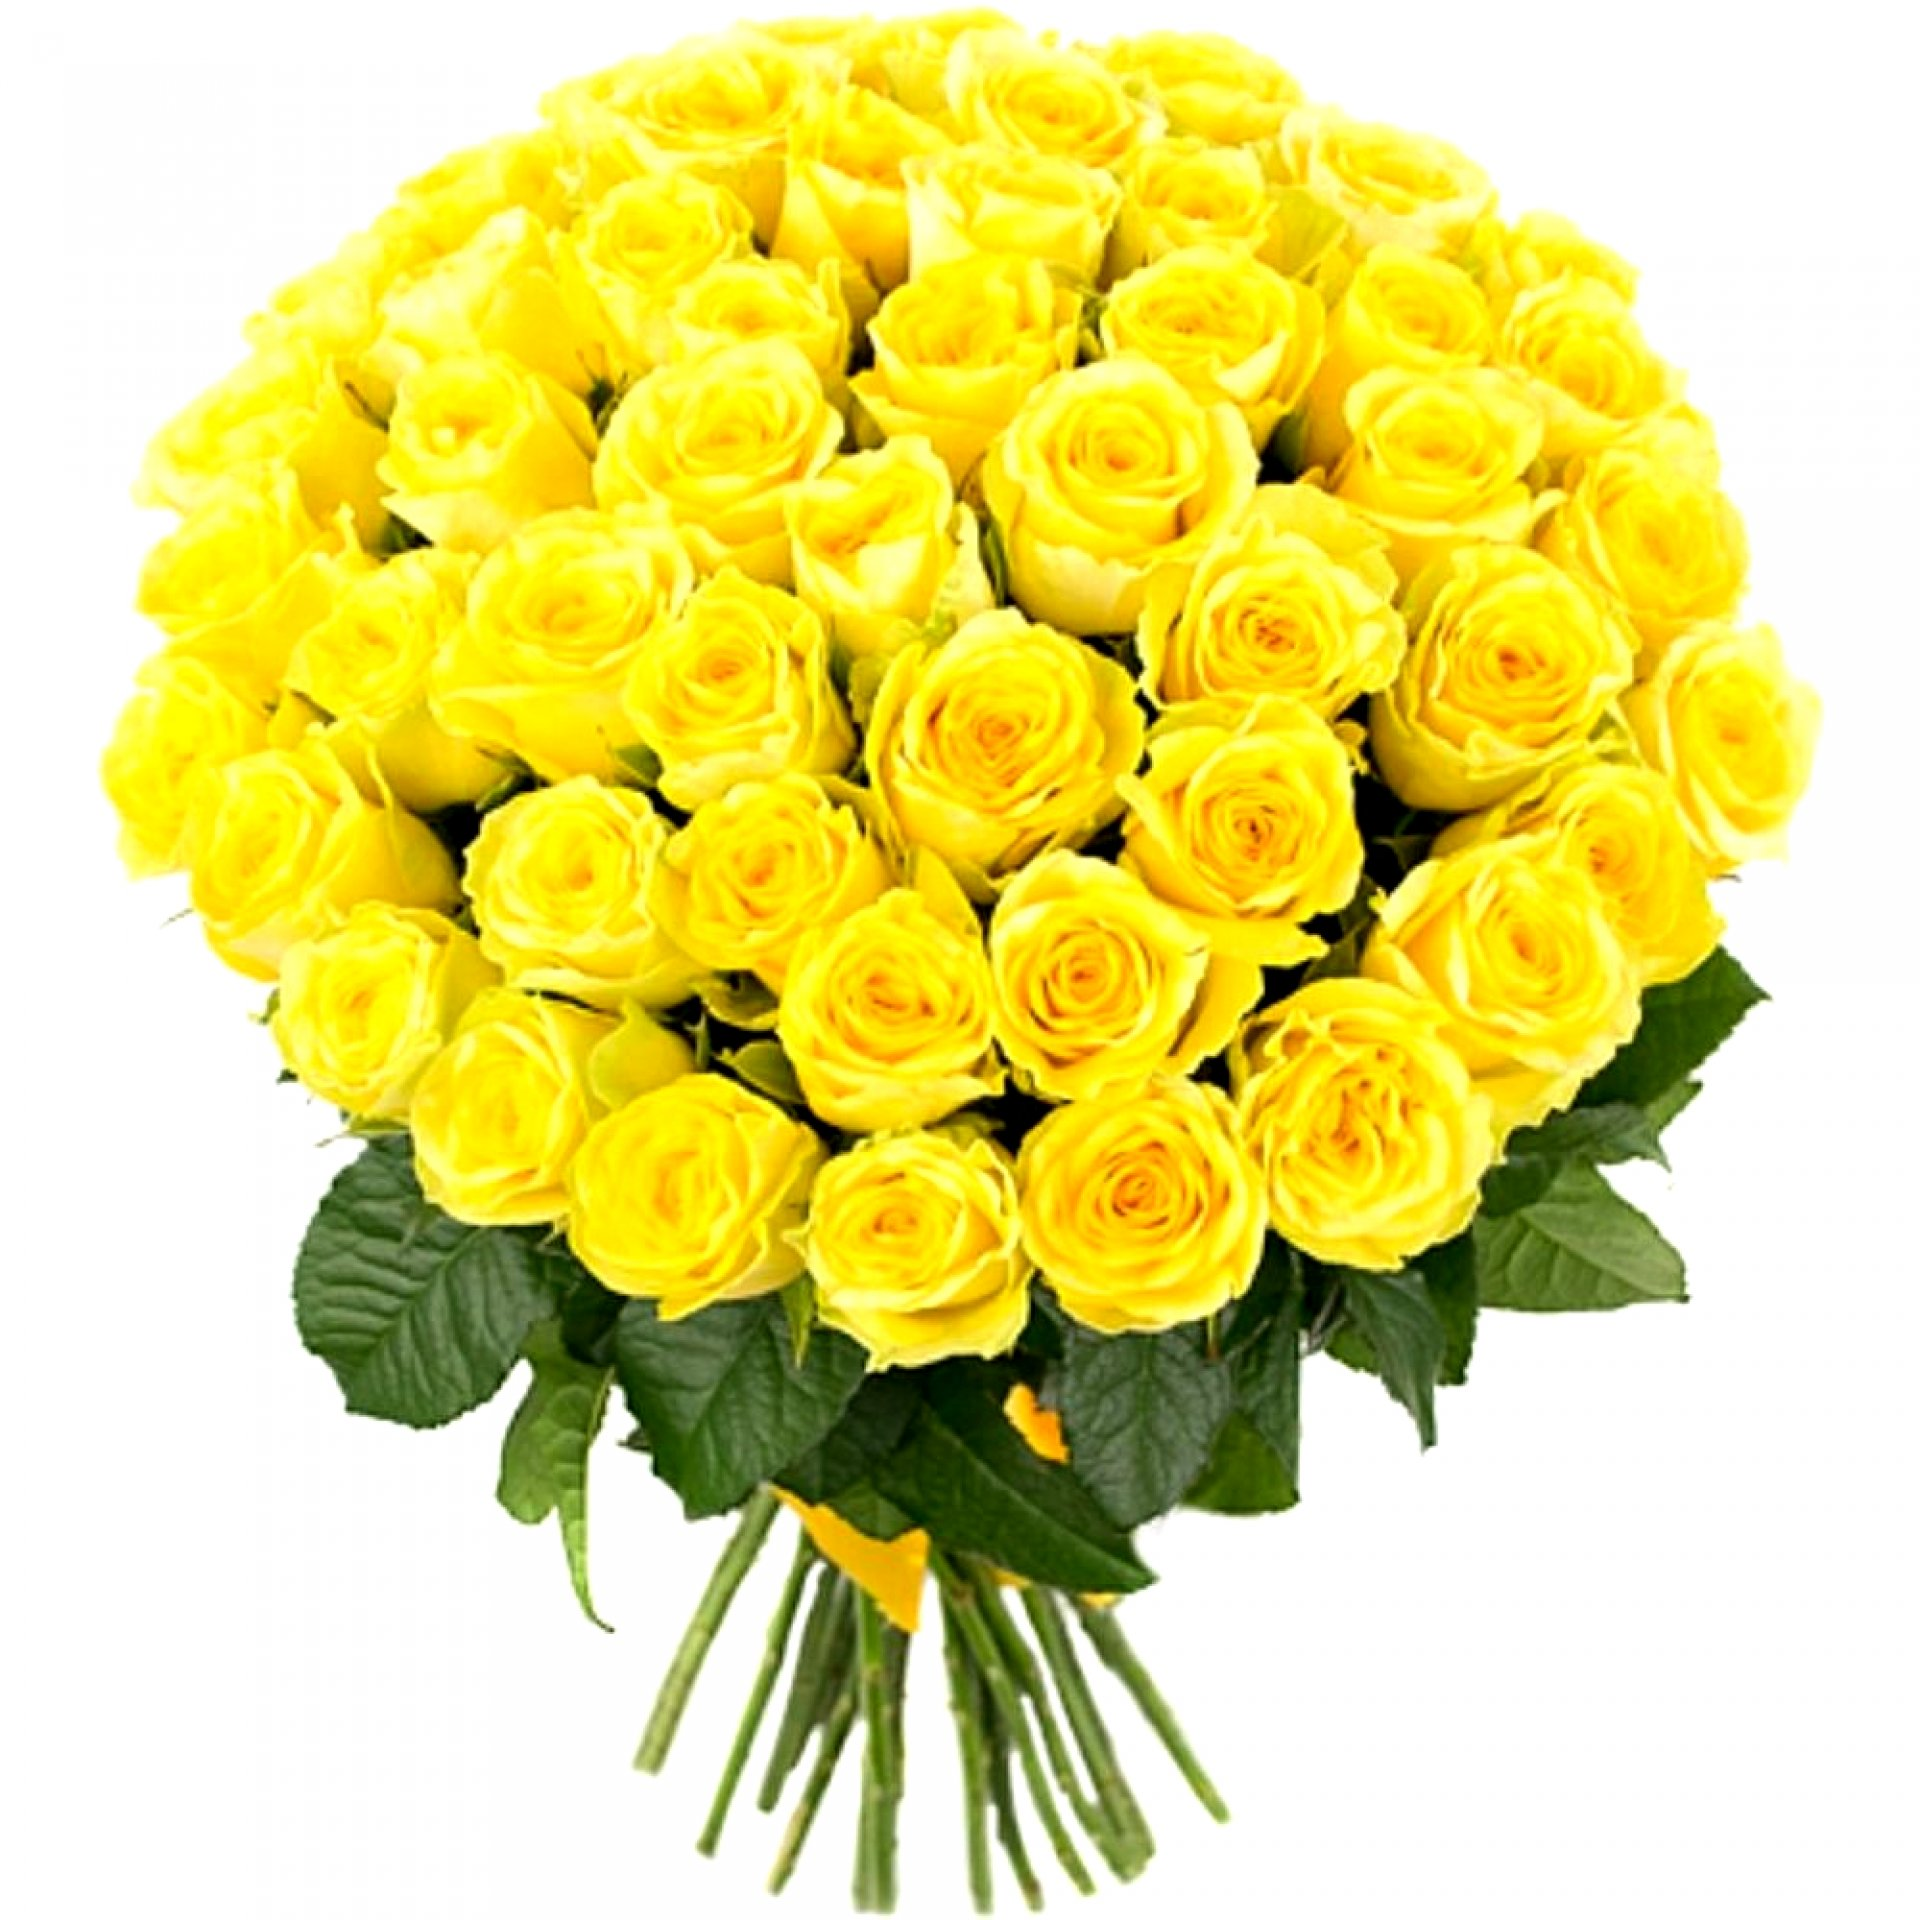 Букет желтых роз (101 шт)